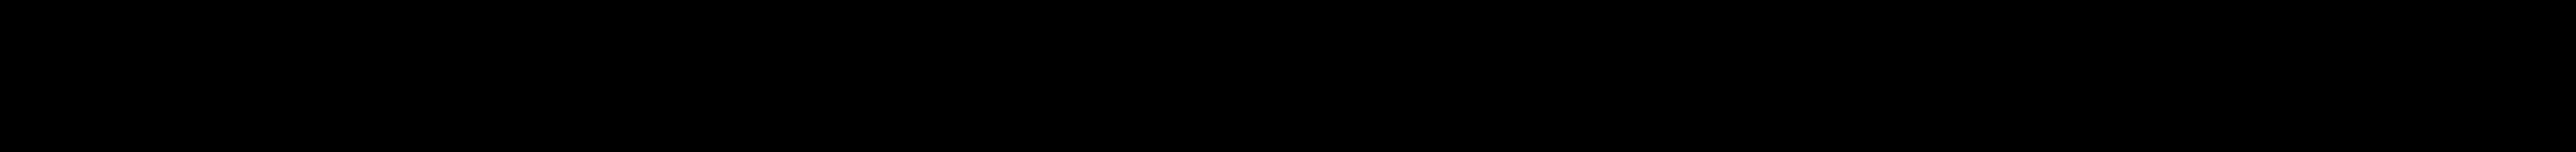 brixton-line-2